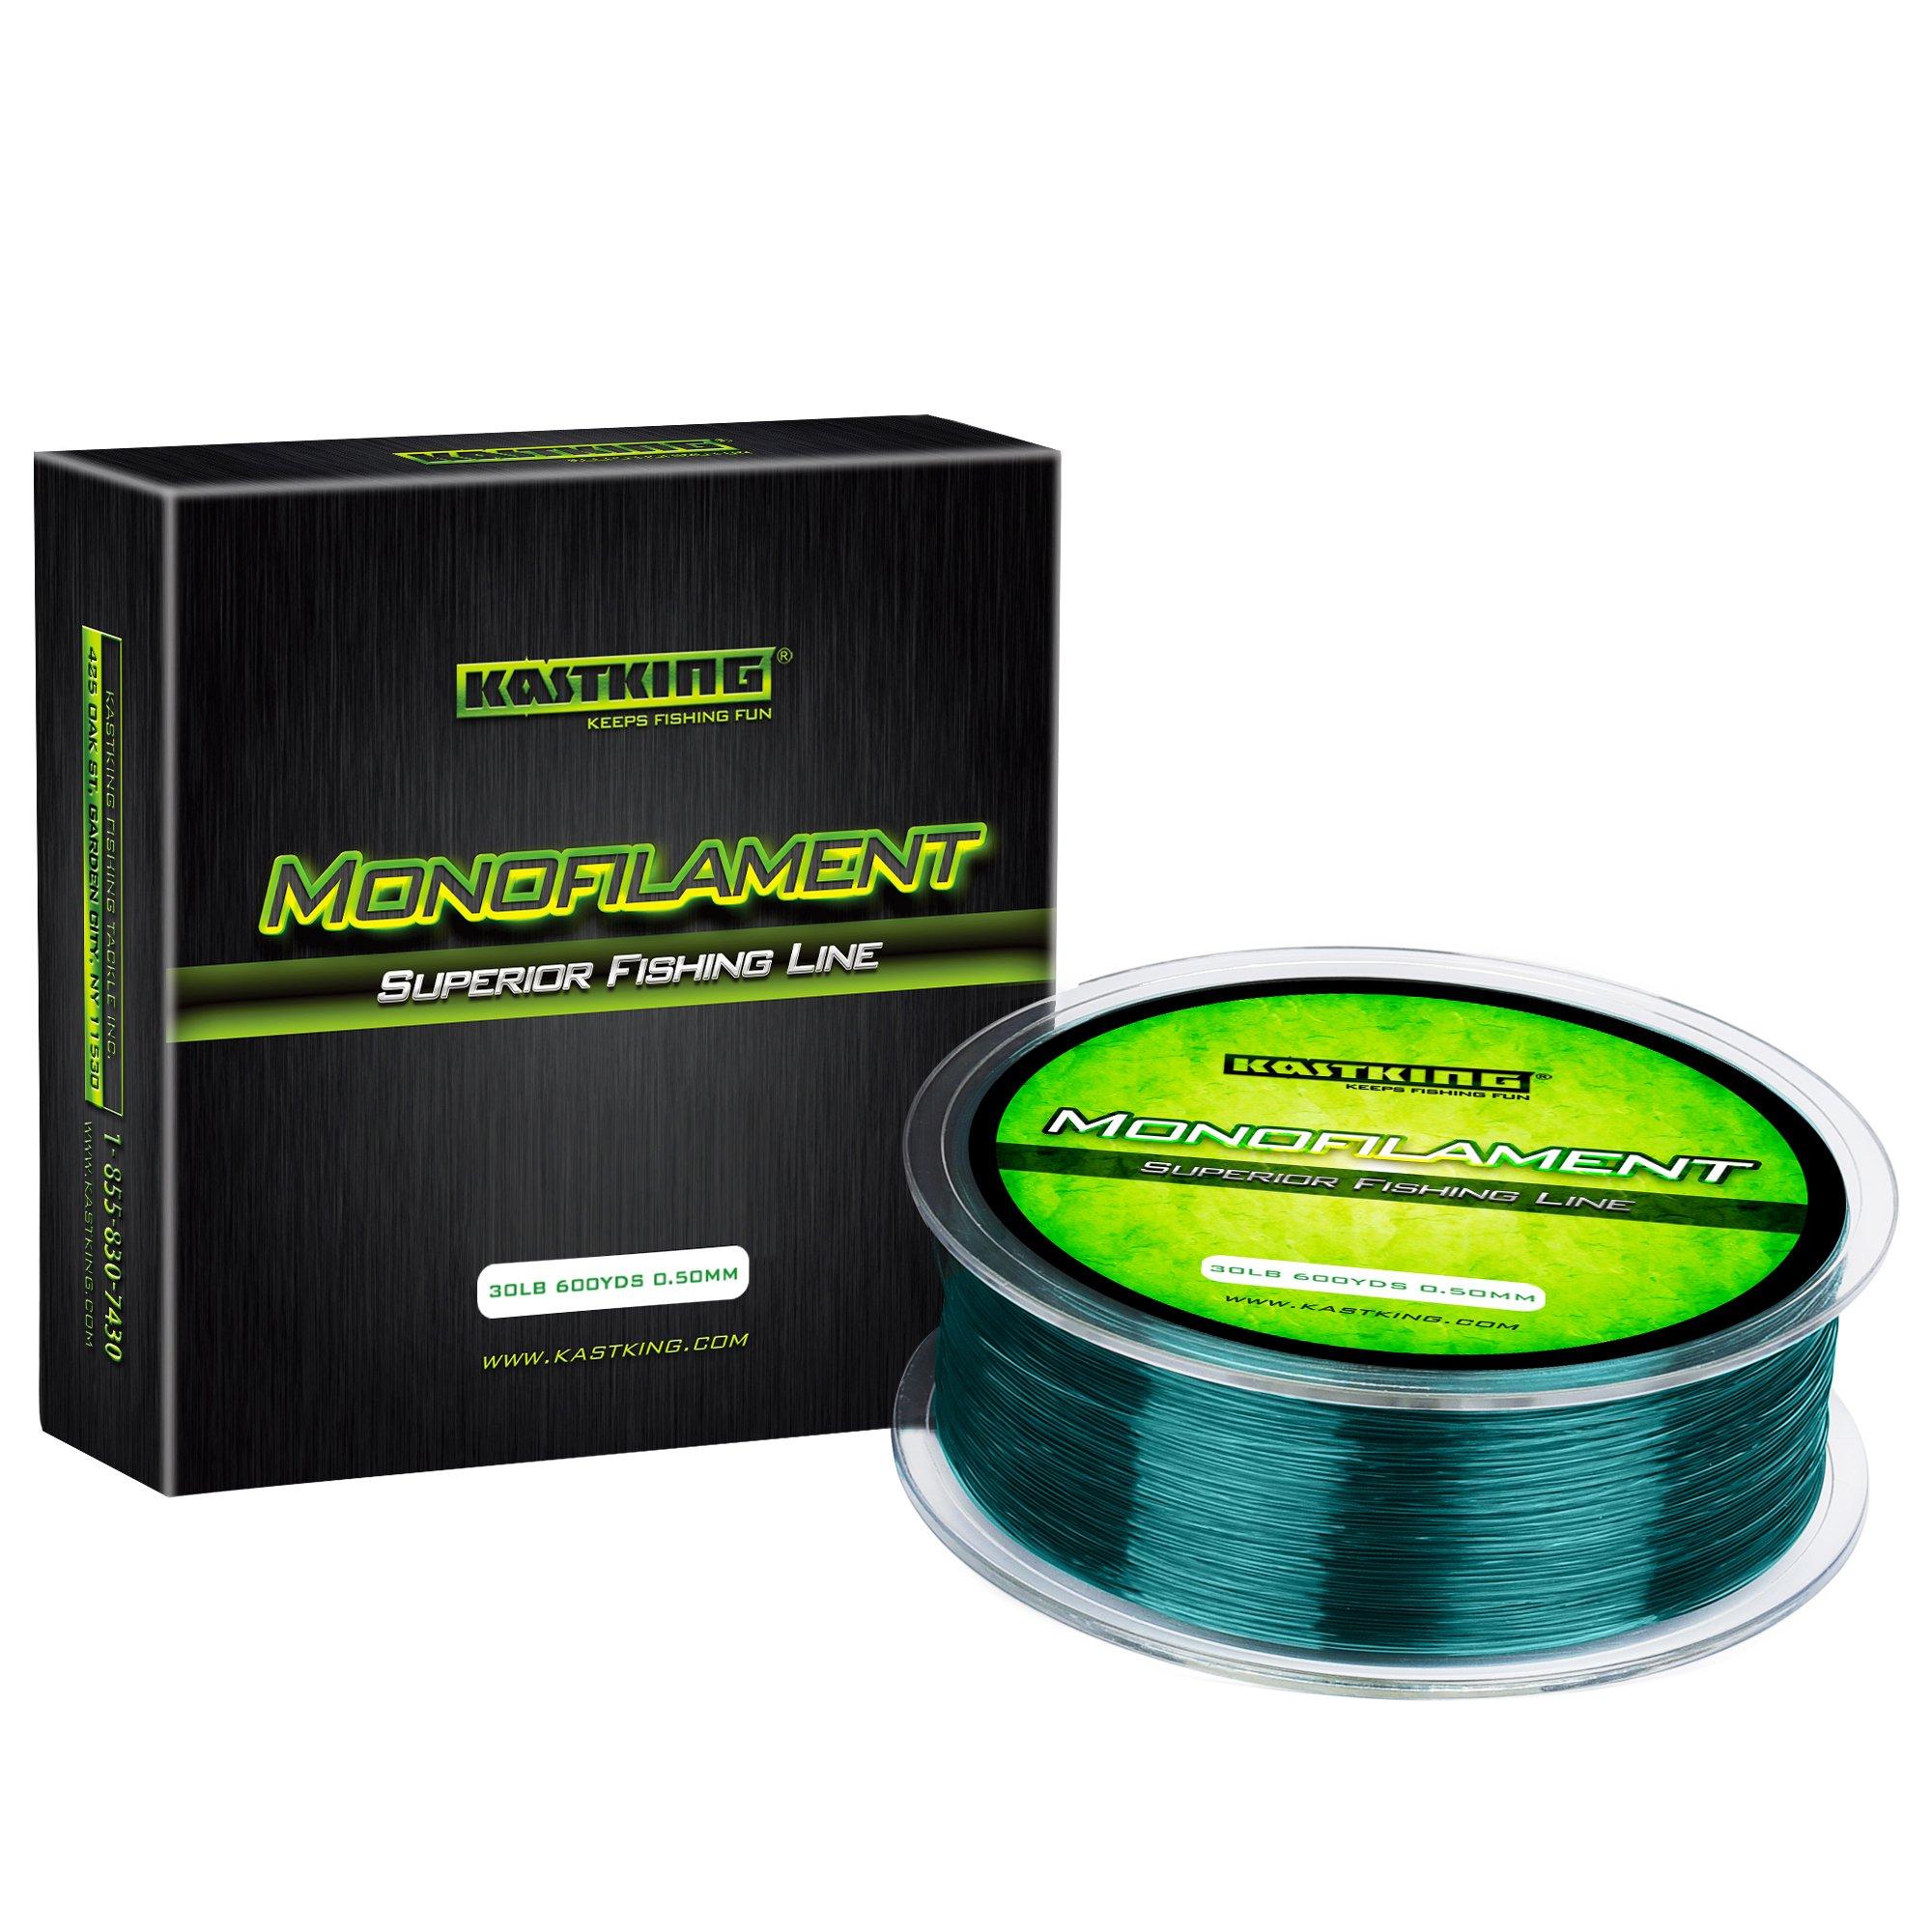 KastKing World's Premium Monofilament 274M/300 Yards - 4LB by KastKing